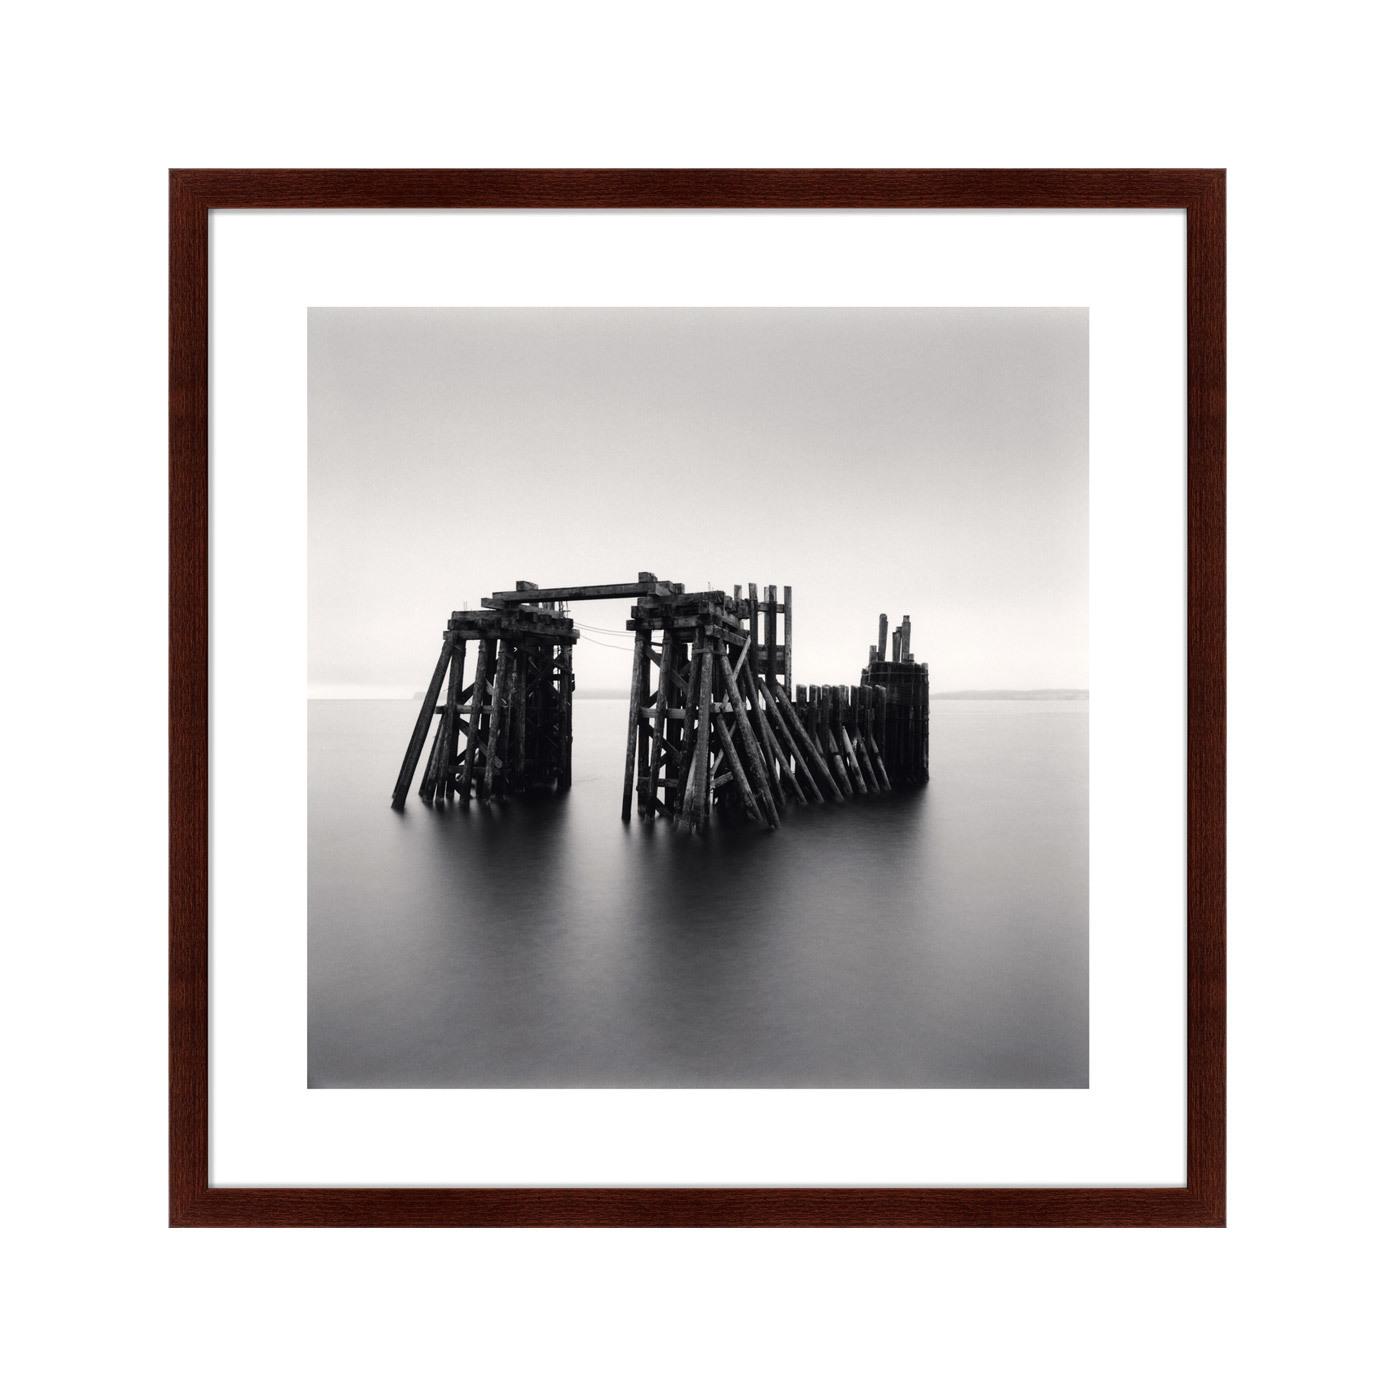 {} Картины в Квартиру Картина Ferry Terminal Remains (79х79 см) картины в квартиру картина sun beams 79х79 см